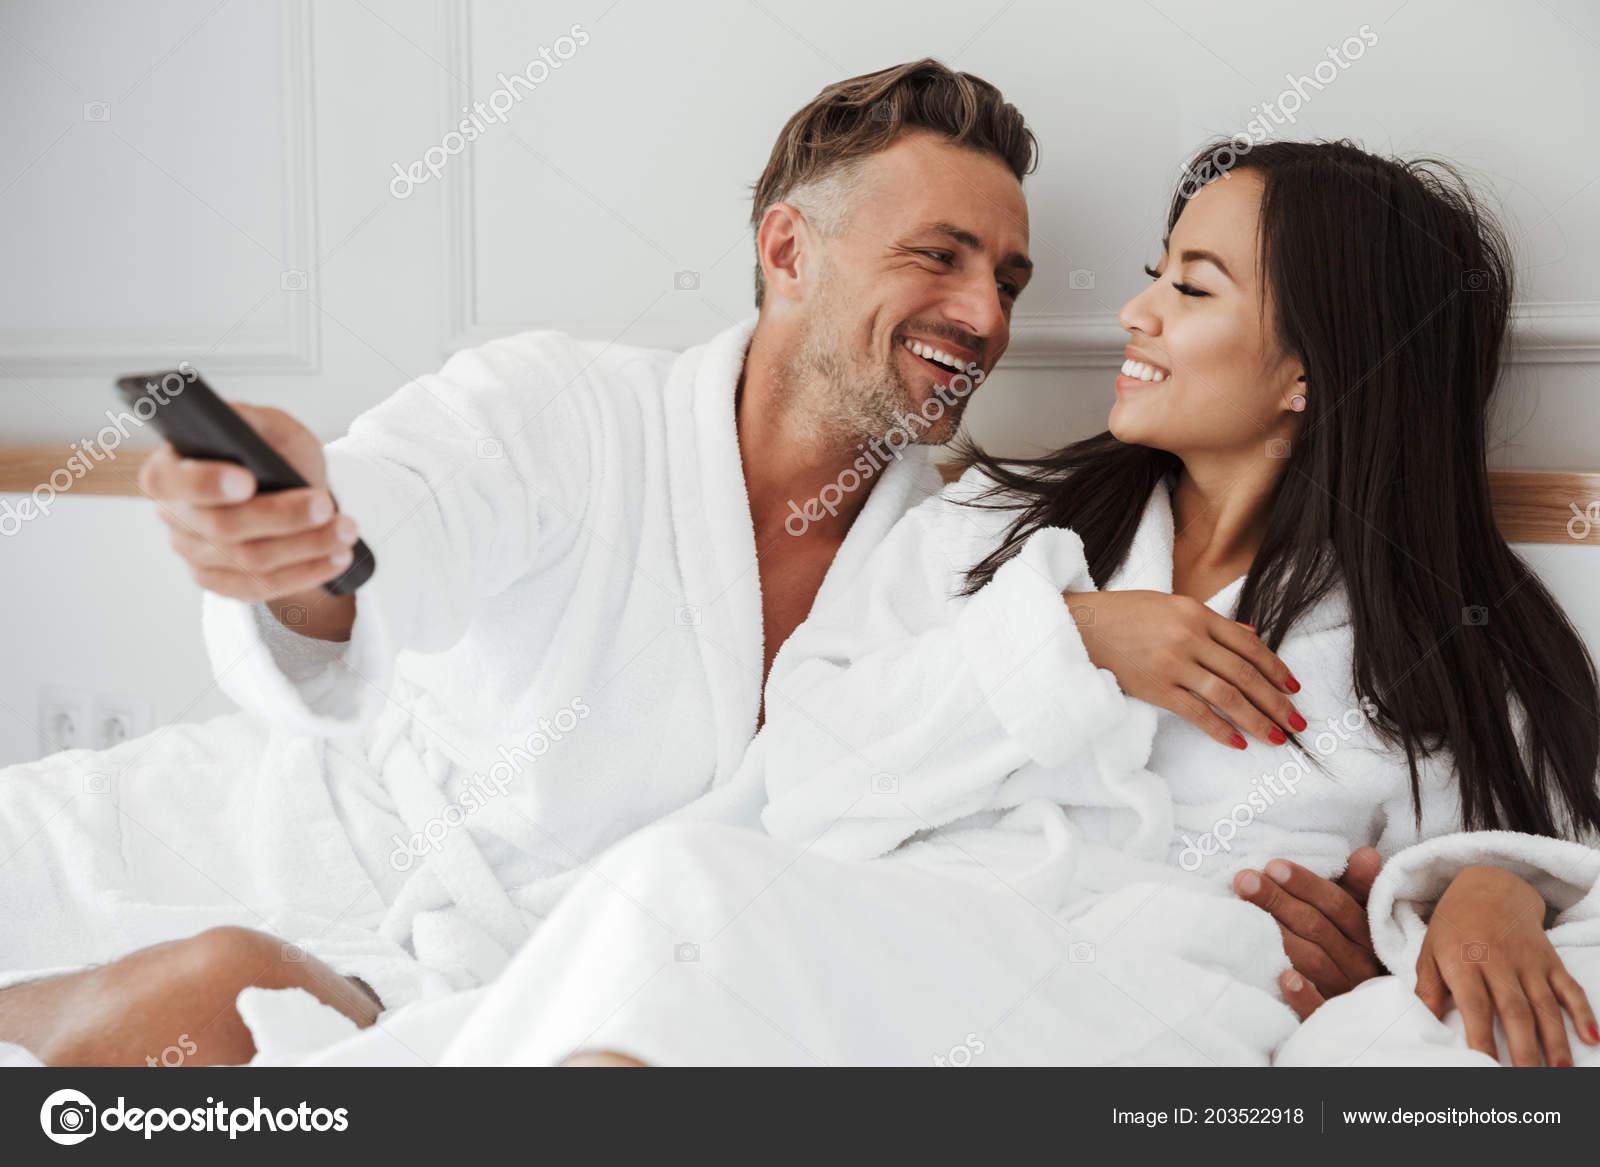 Asian woman and caucasian man